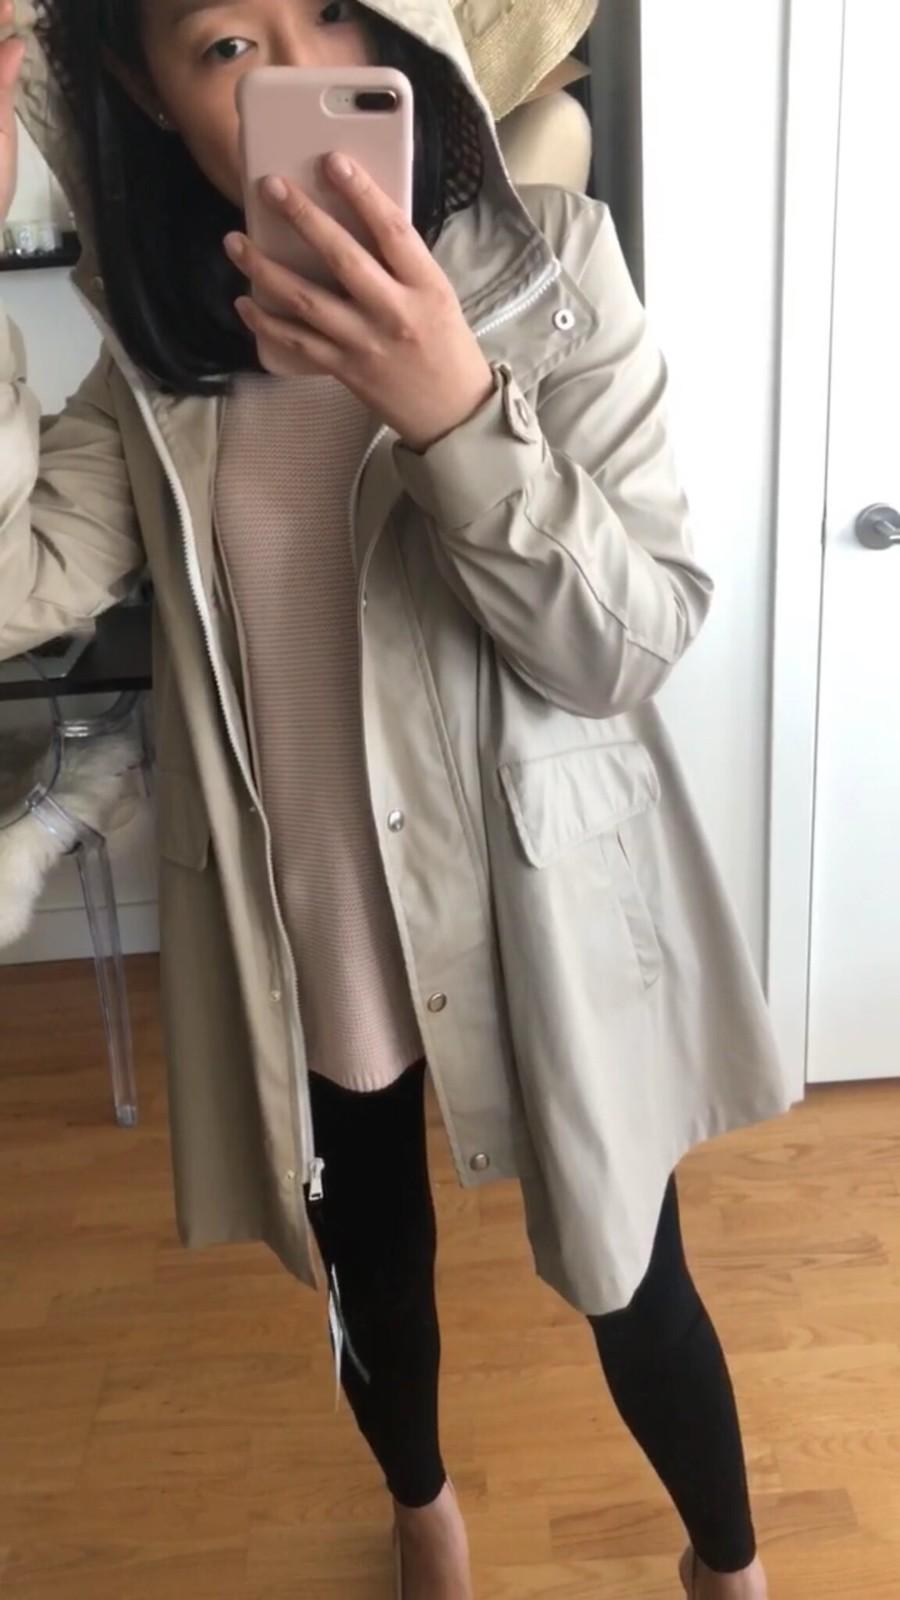 Zara Cape Raincoat (item no. 2969/244), size XS